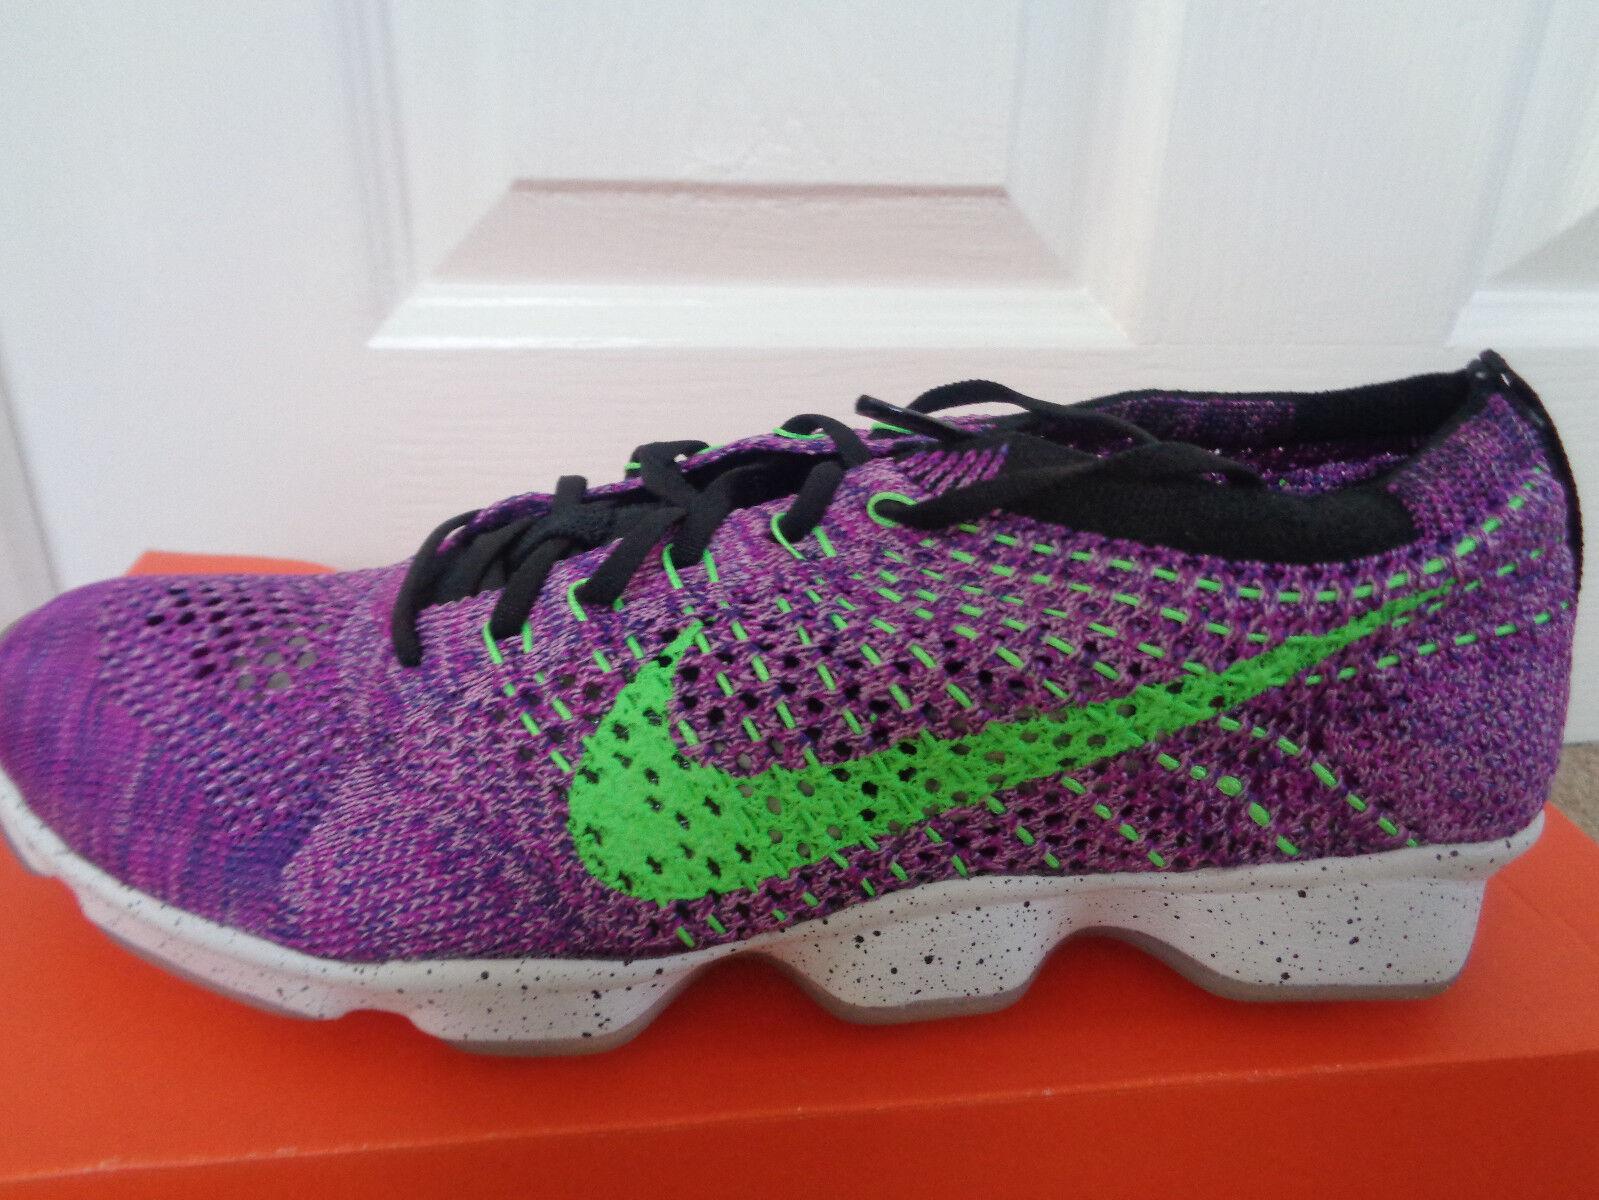 Nike Flyknit Zoom Agility trainers sneakers 698616 501 uk 4.5 eu 38 us 7 NEW+BOX